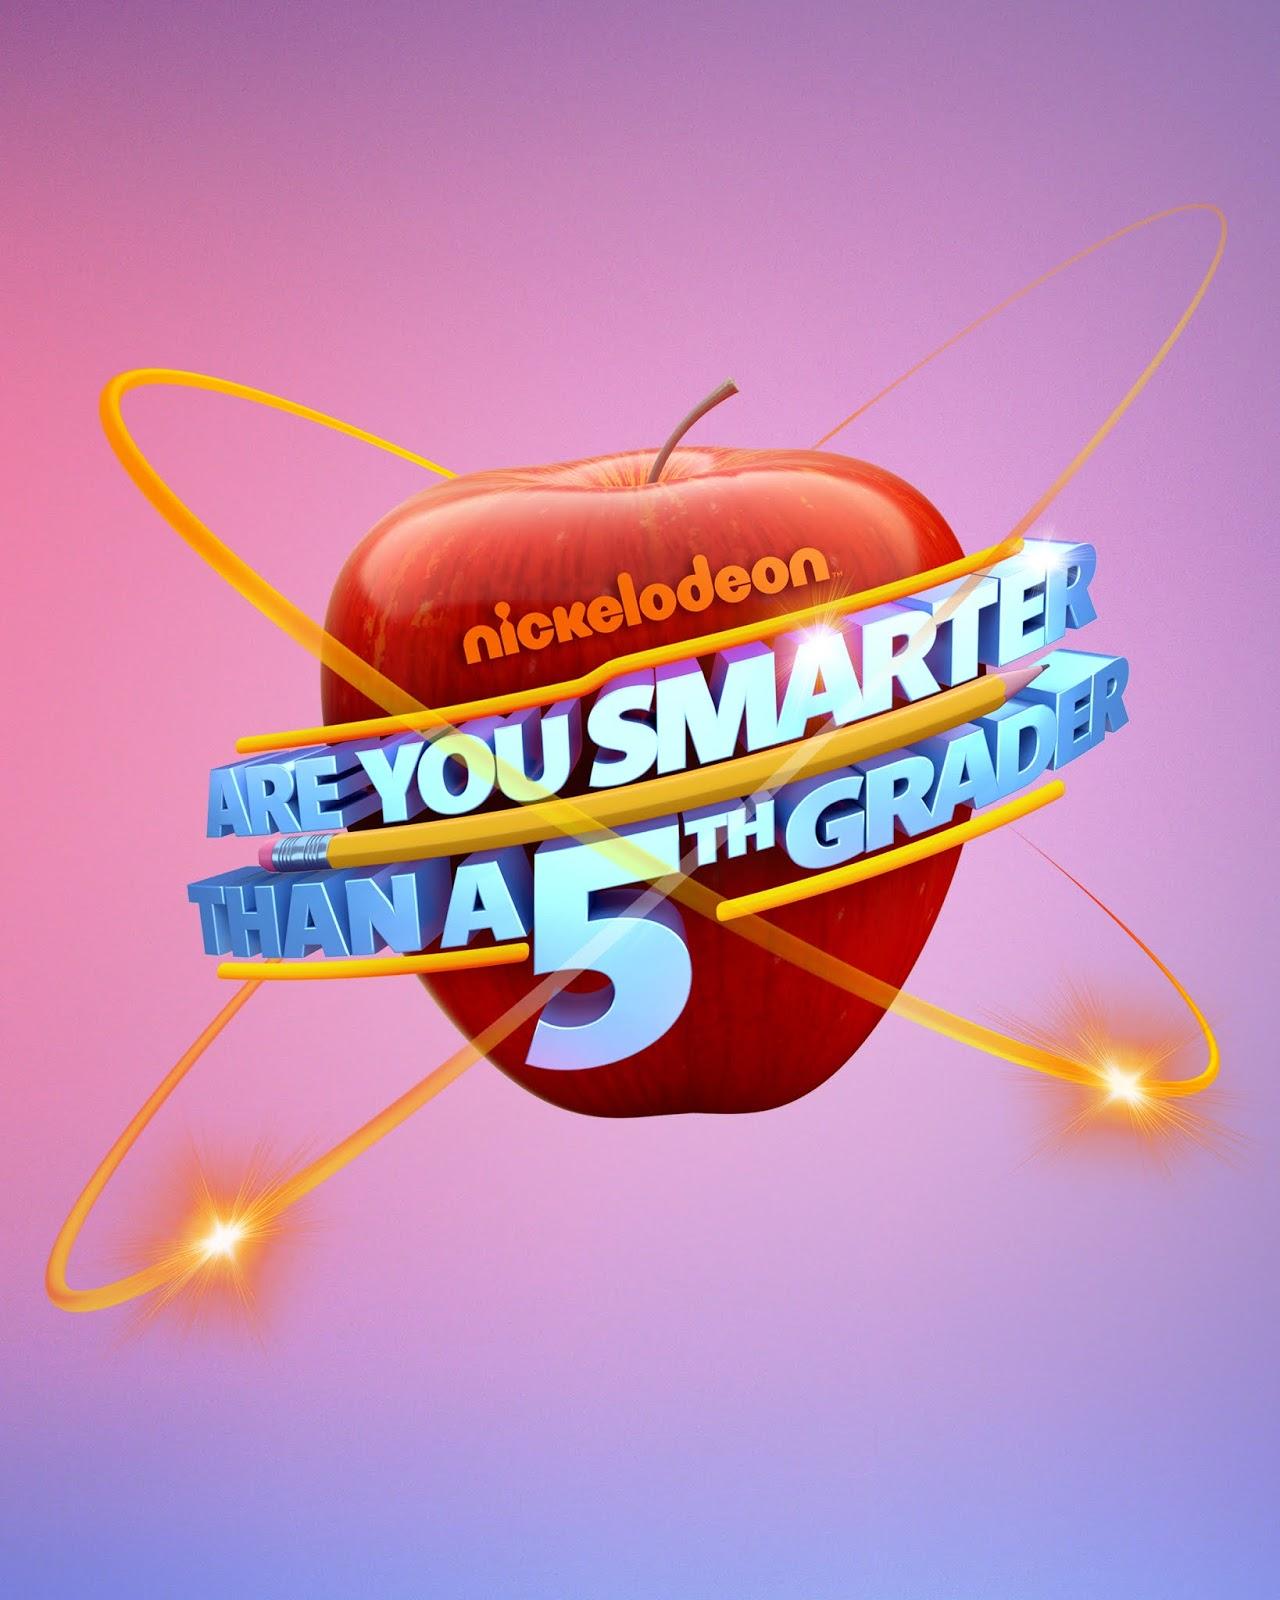 Nickelodeon Logo 2019 : nickelodeon, NickALive!:, Nickelodeon, Brings, Smarter, Grader';, Superstar, All-New, Version, Family, Upfront